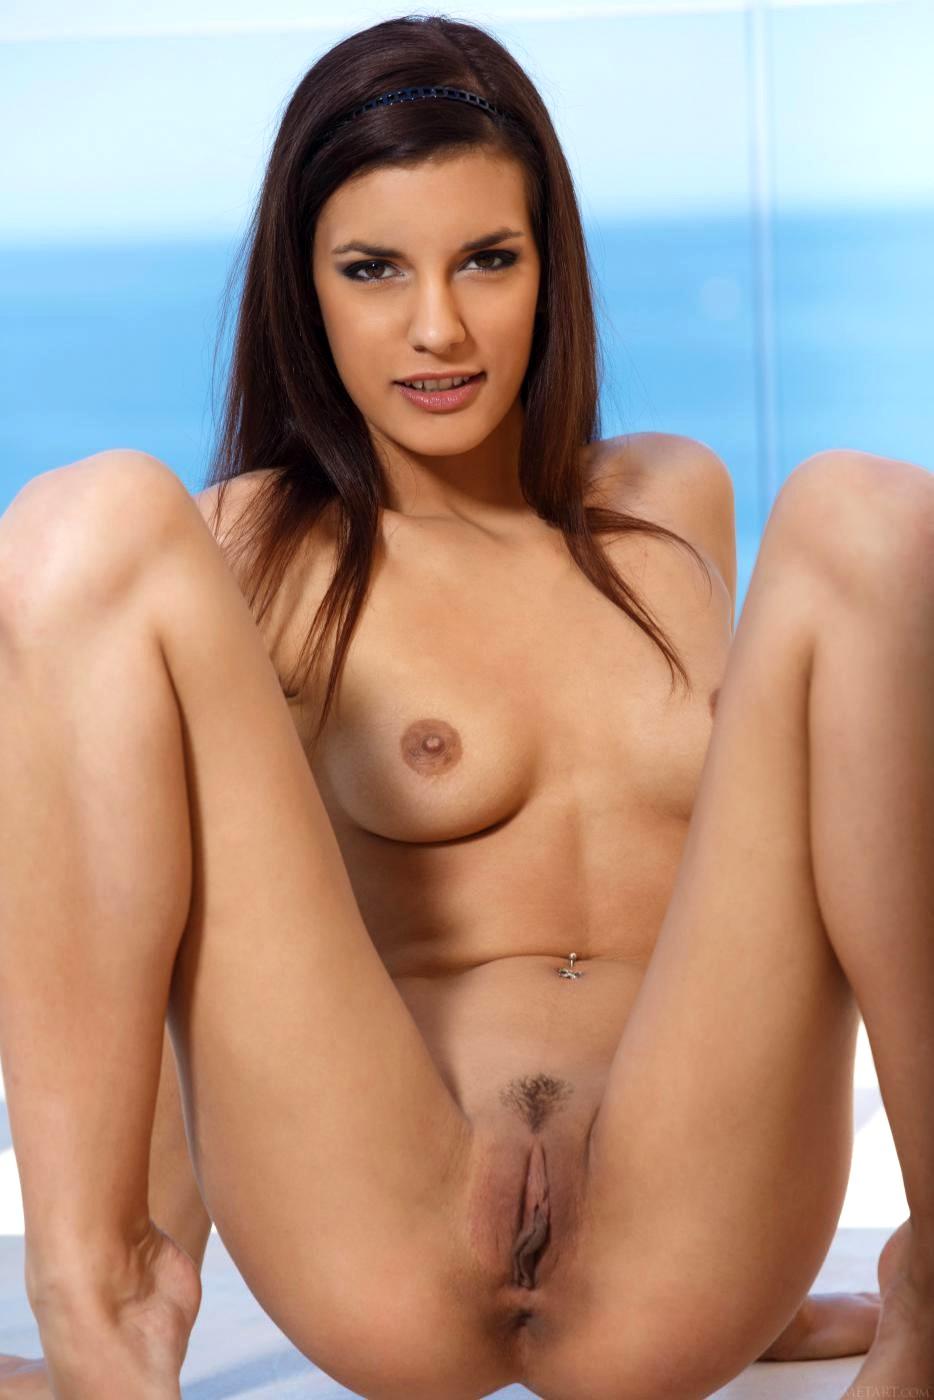 greek female pornstars naked